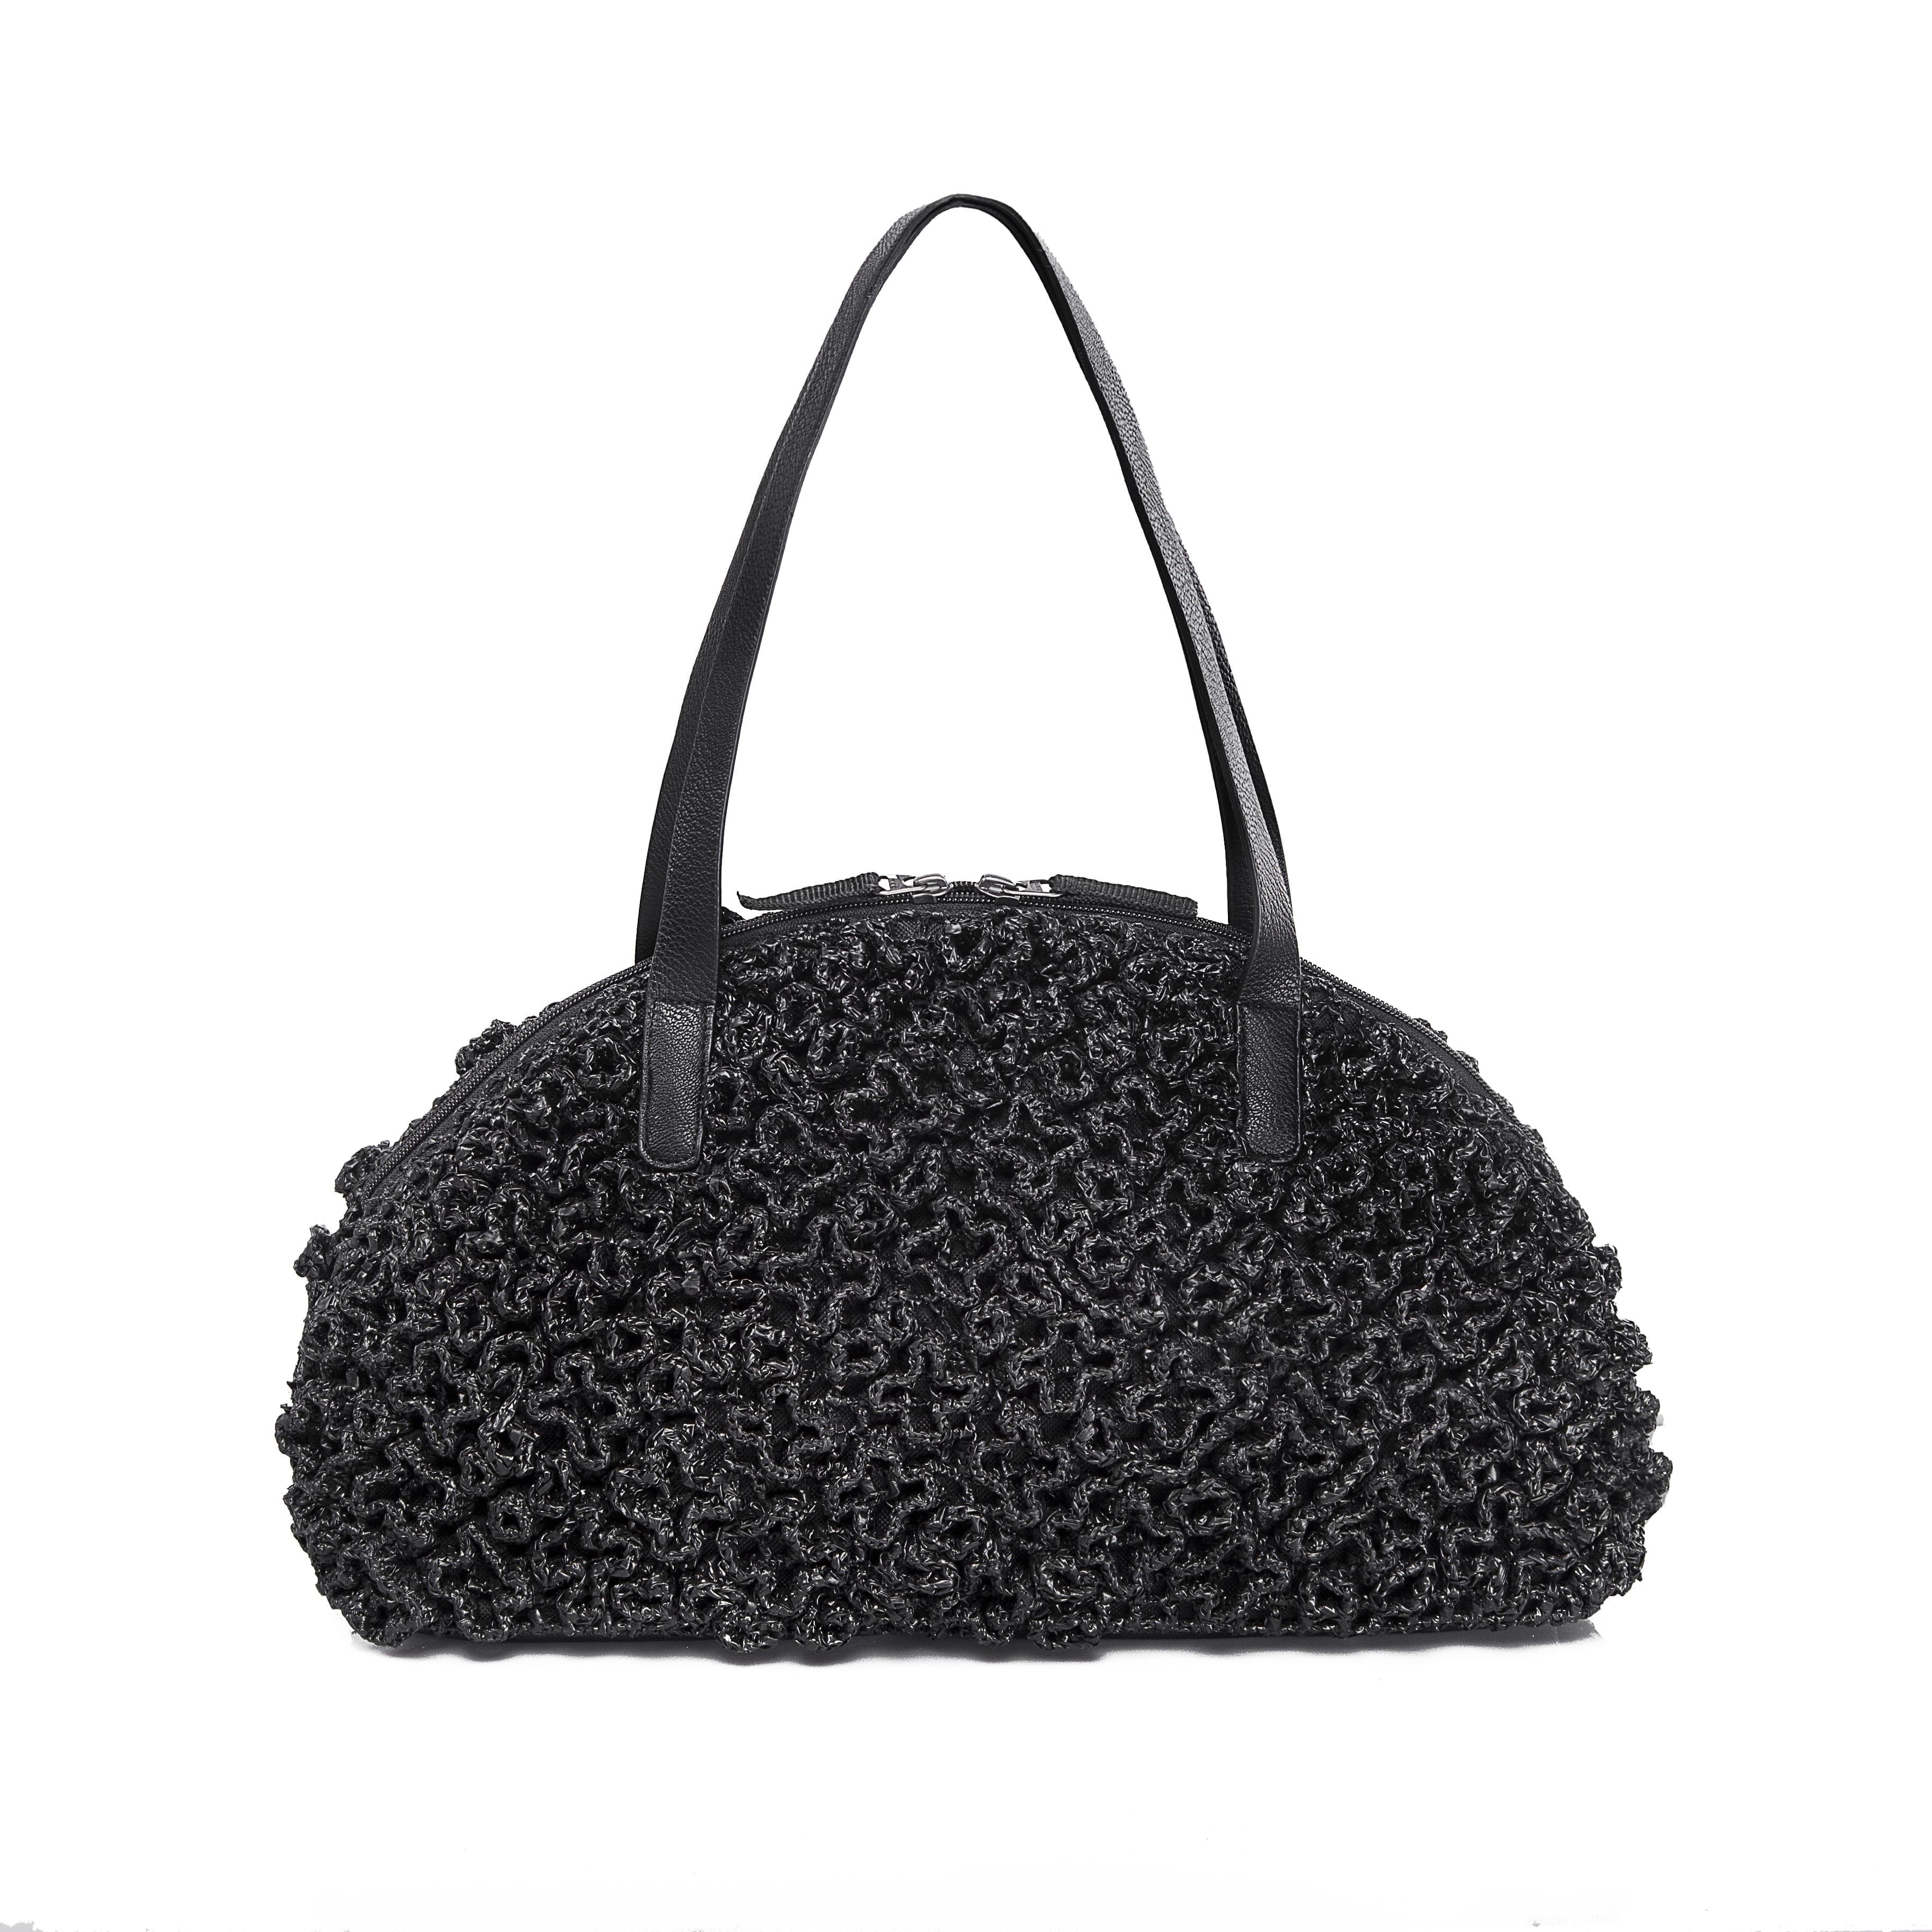 Dapper - Eco-friendly Hand Bag